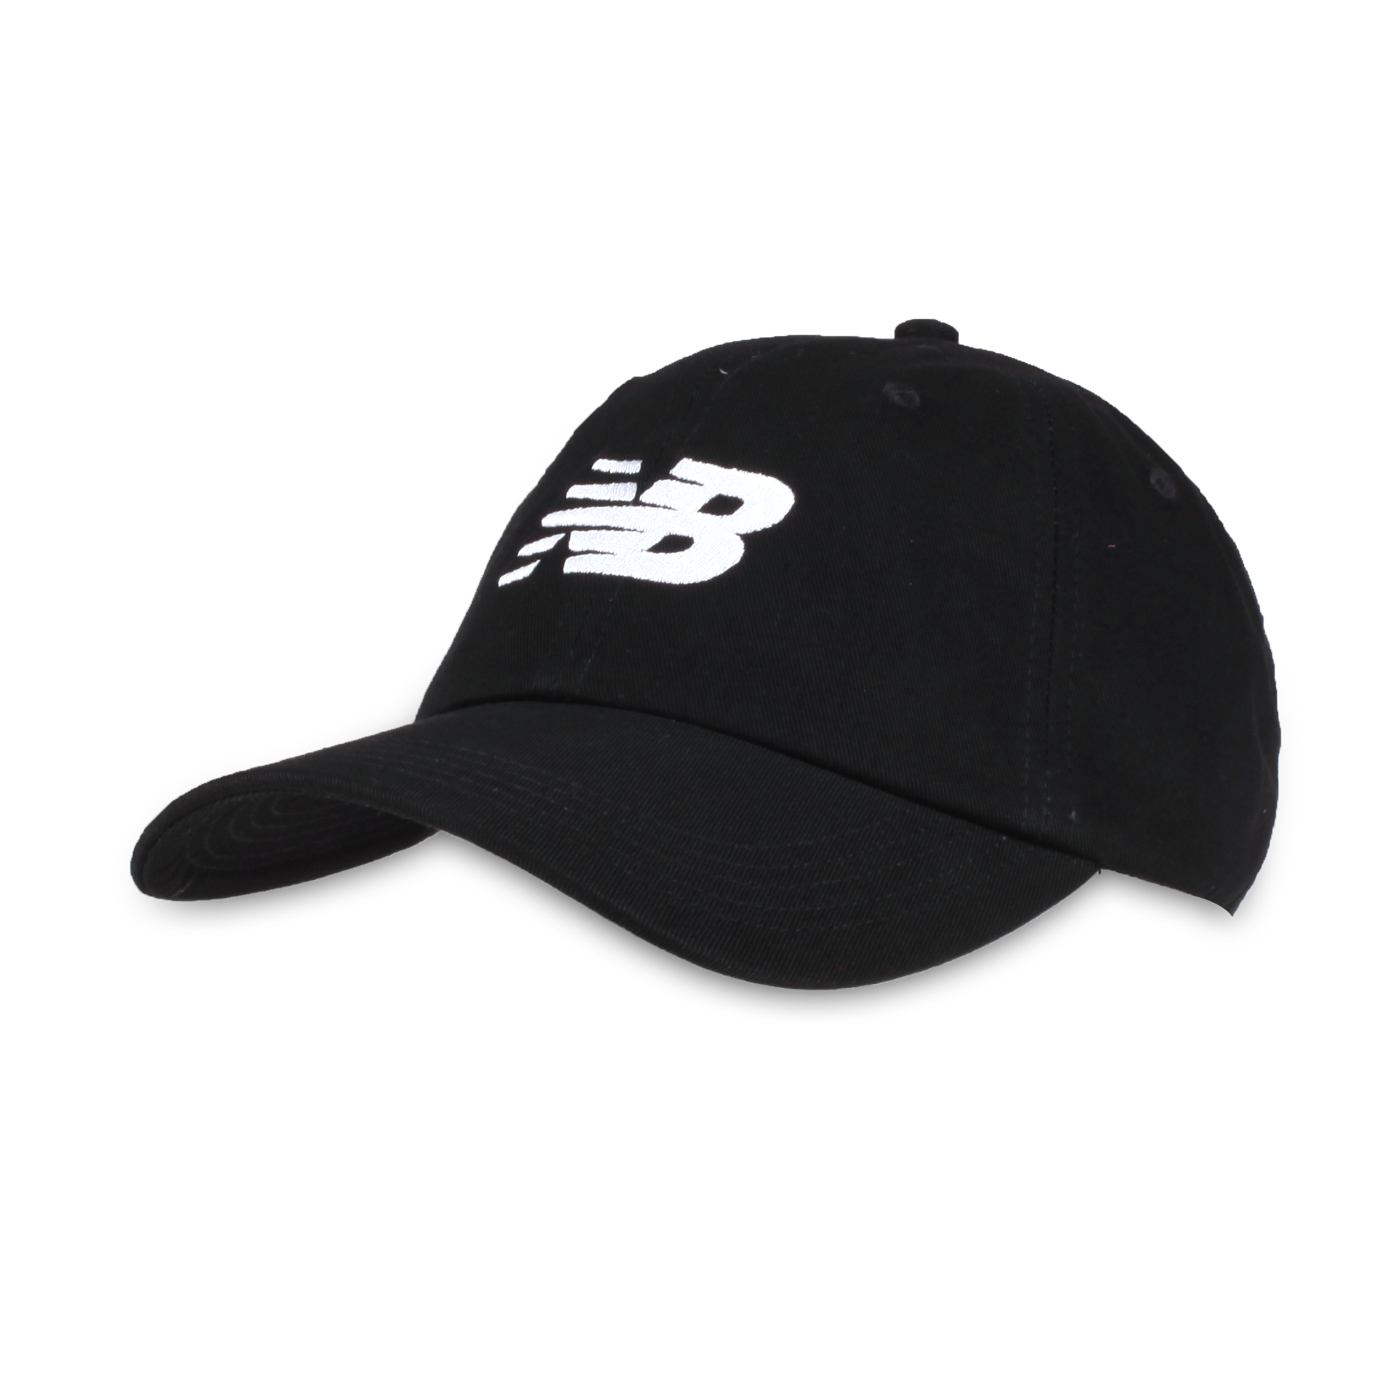 NEW BALANCE 棒球帽 LAH91017BK - 黑白